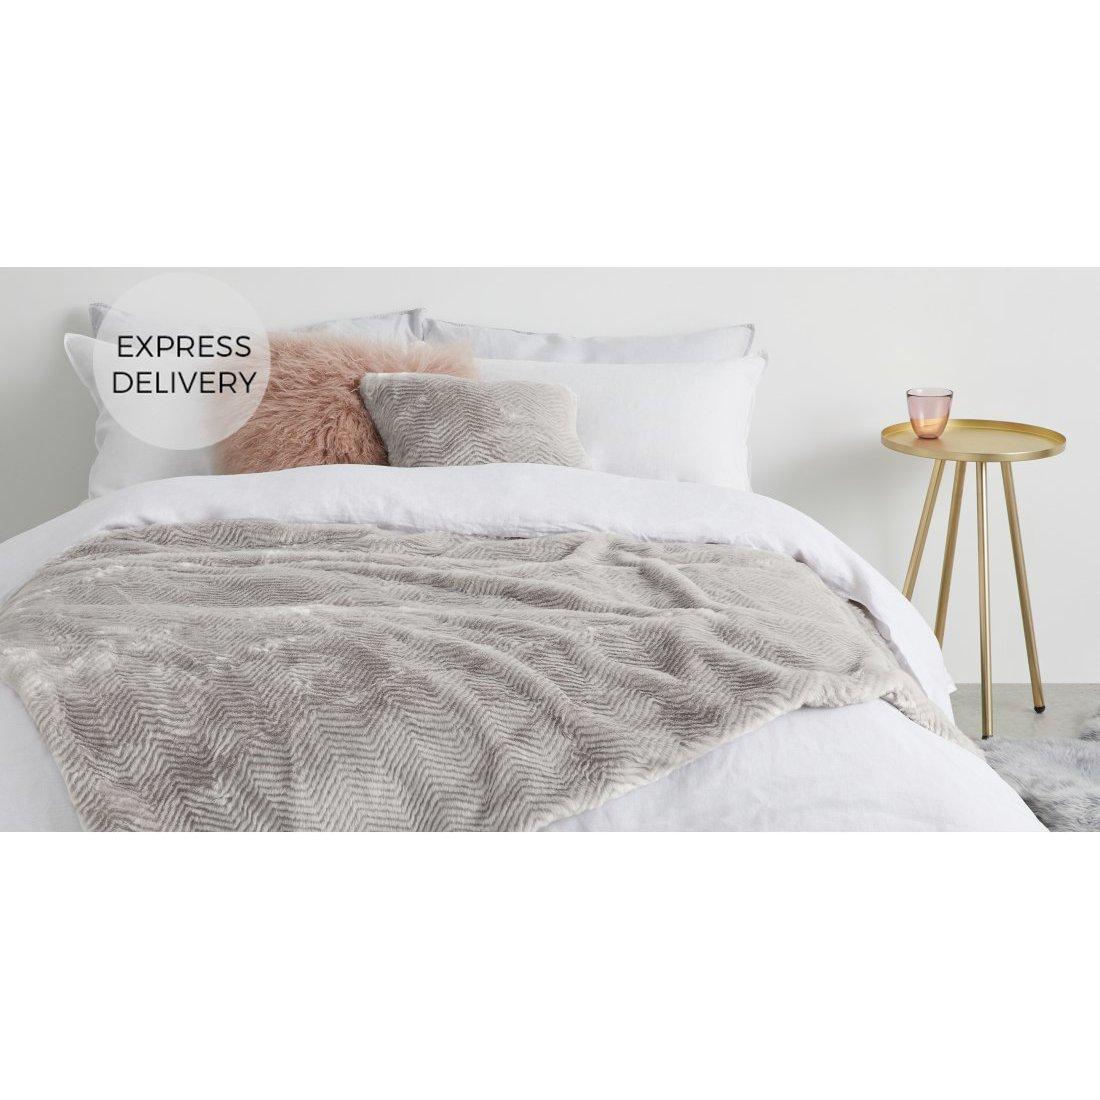 image-Chevron Luxury Faux Fur Throw, 130 x 170cm, Pewter Grey